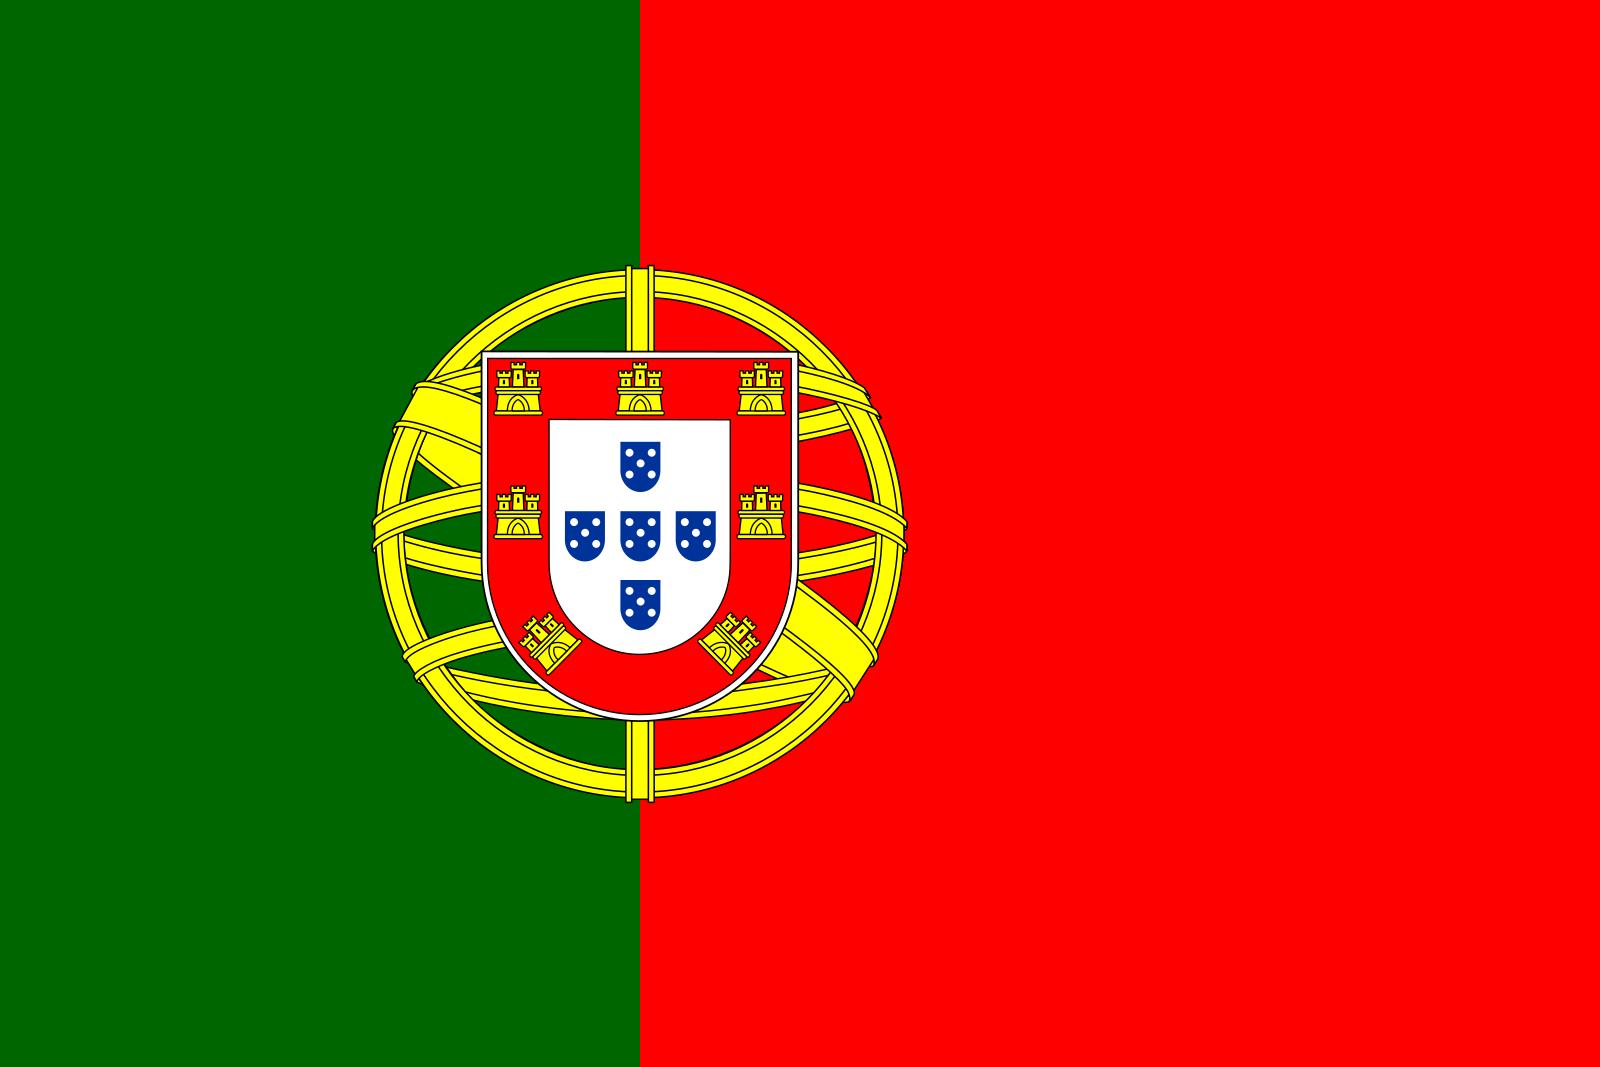 bandeira de portugal 1 - Bandeira de Portugal